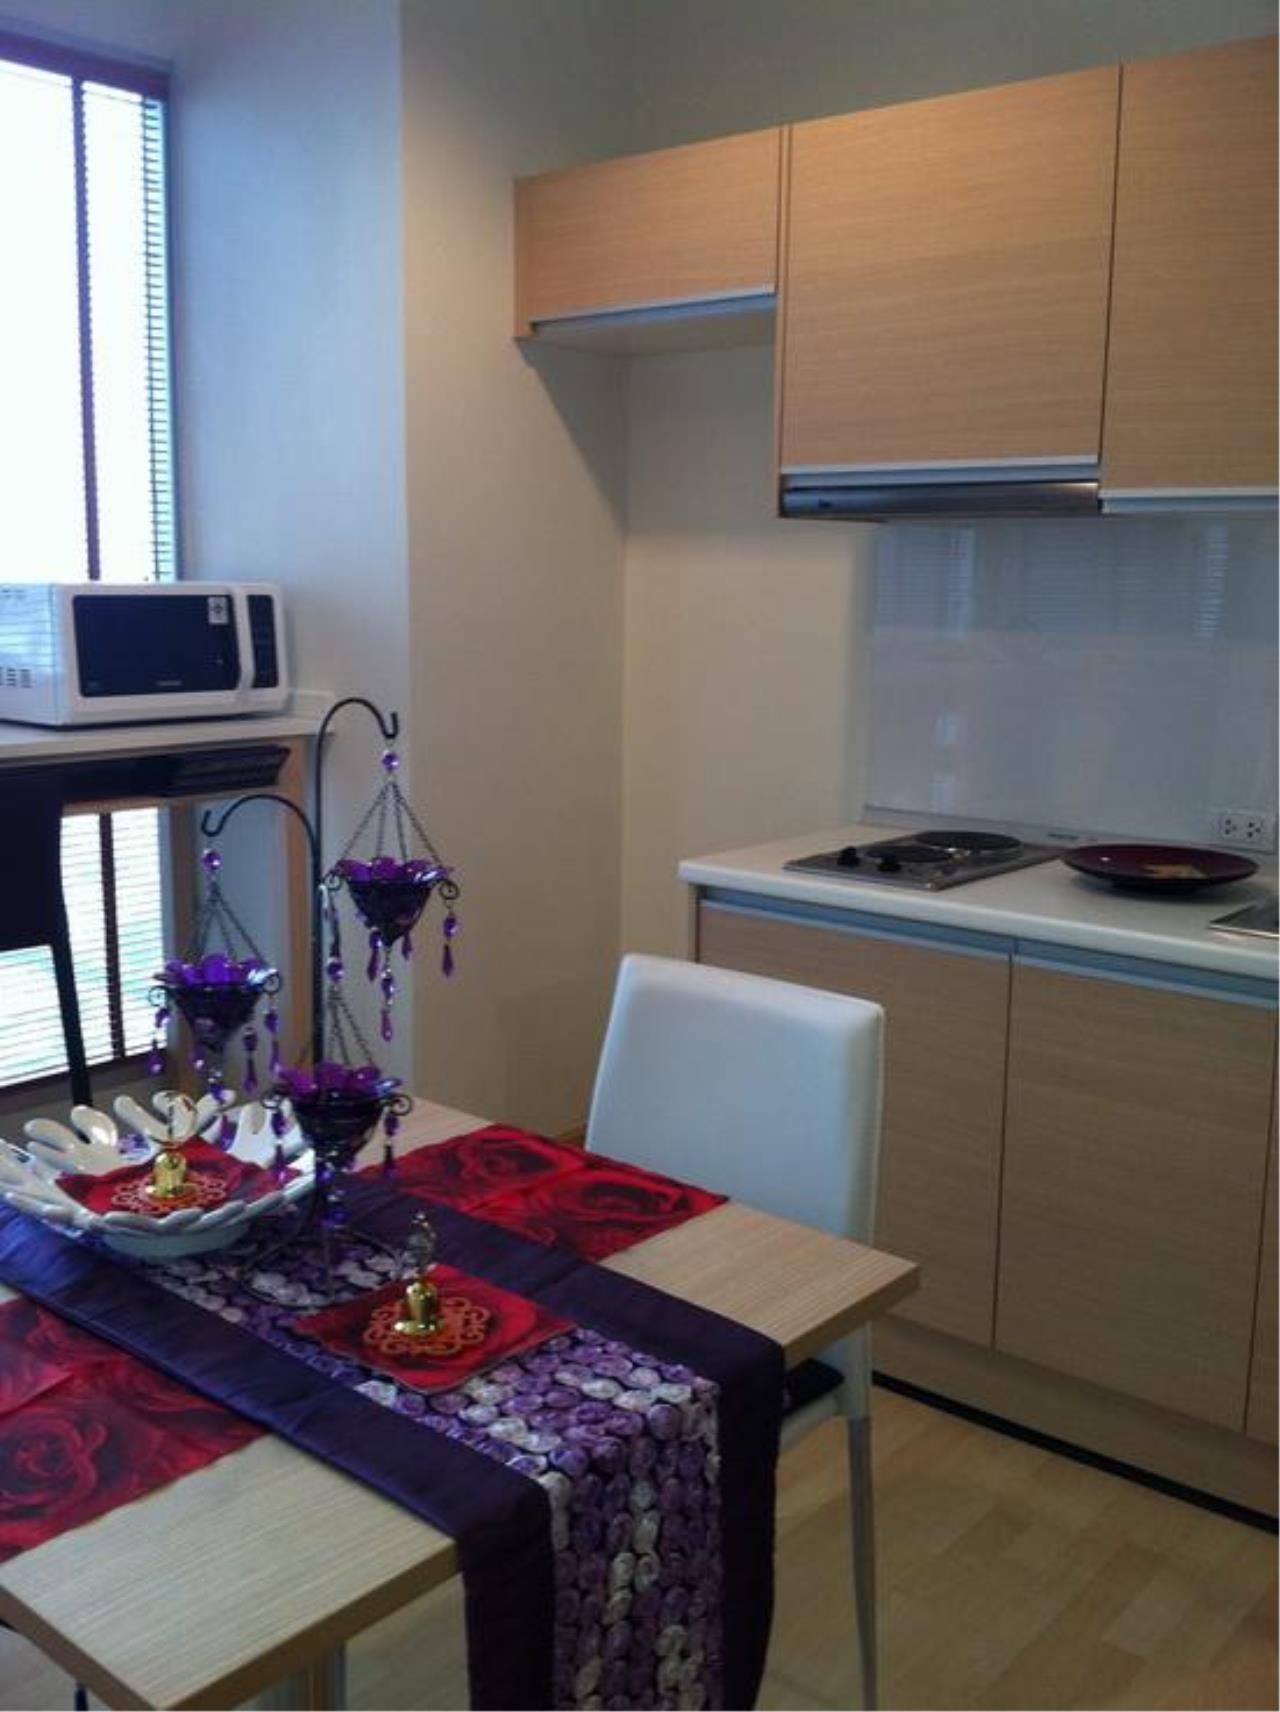 Piri Property Agency's one bedroom  For Rent Rhythm Ratchada - Huay Kwang 2